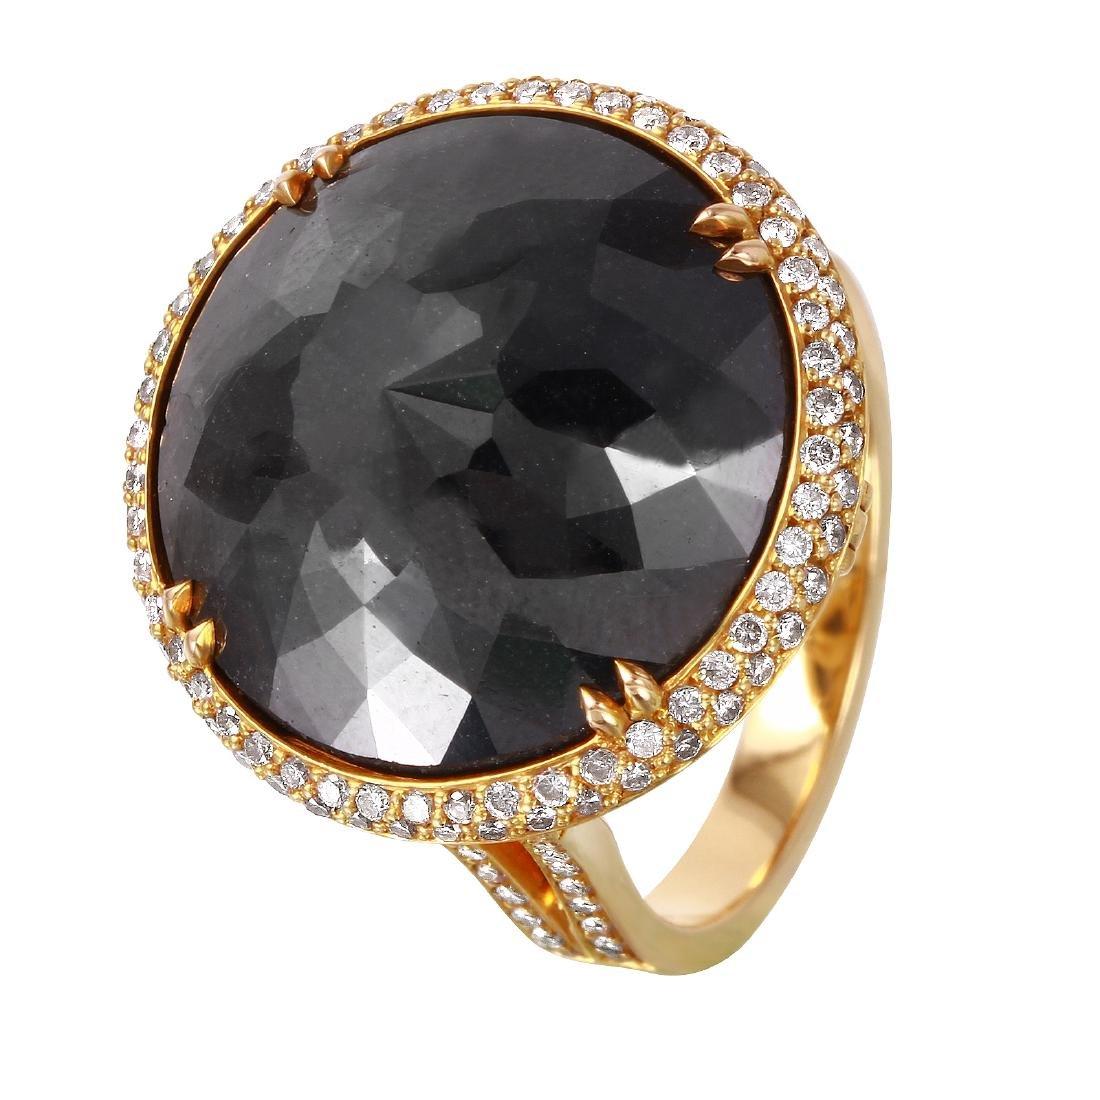 18KT Rose Gold Diamond Ring & Pendnat Set